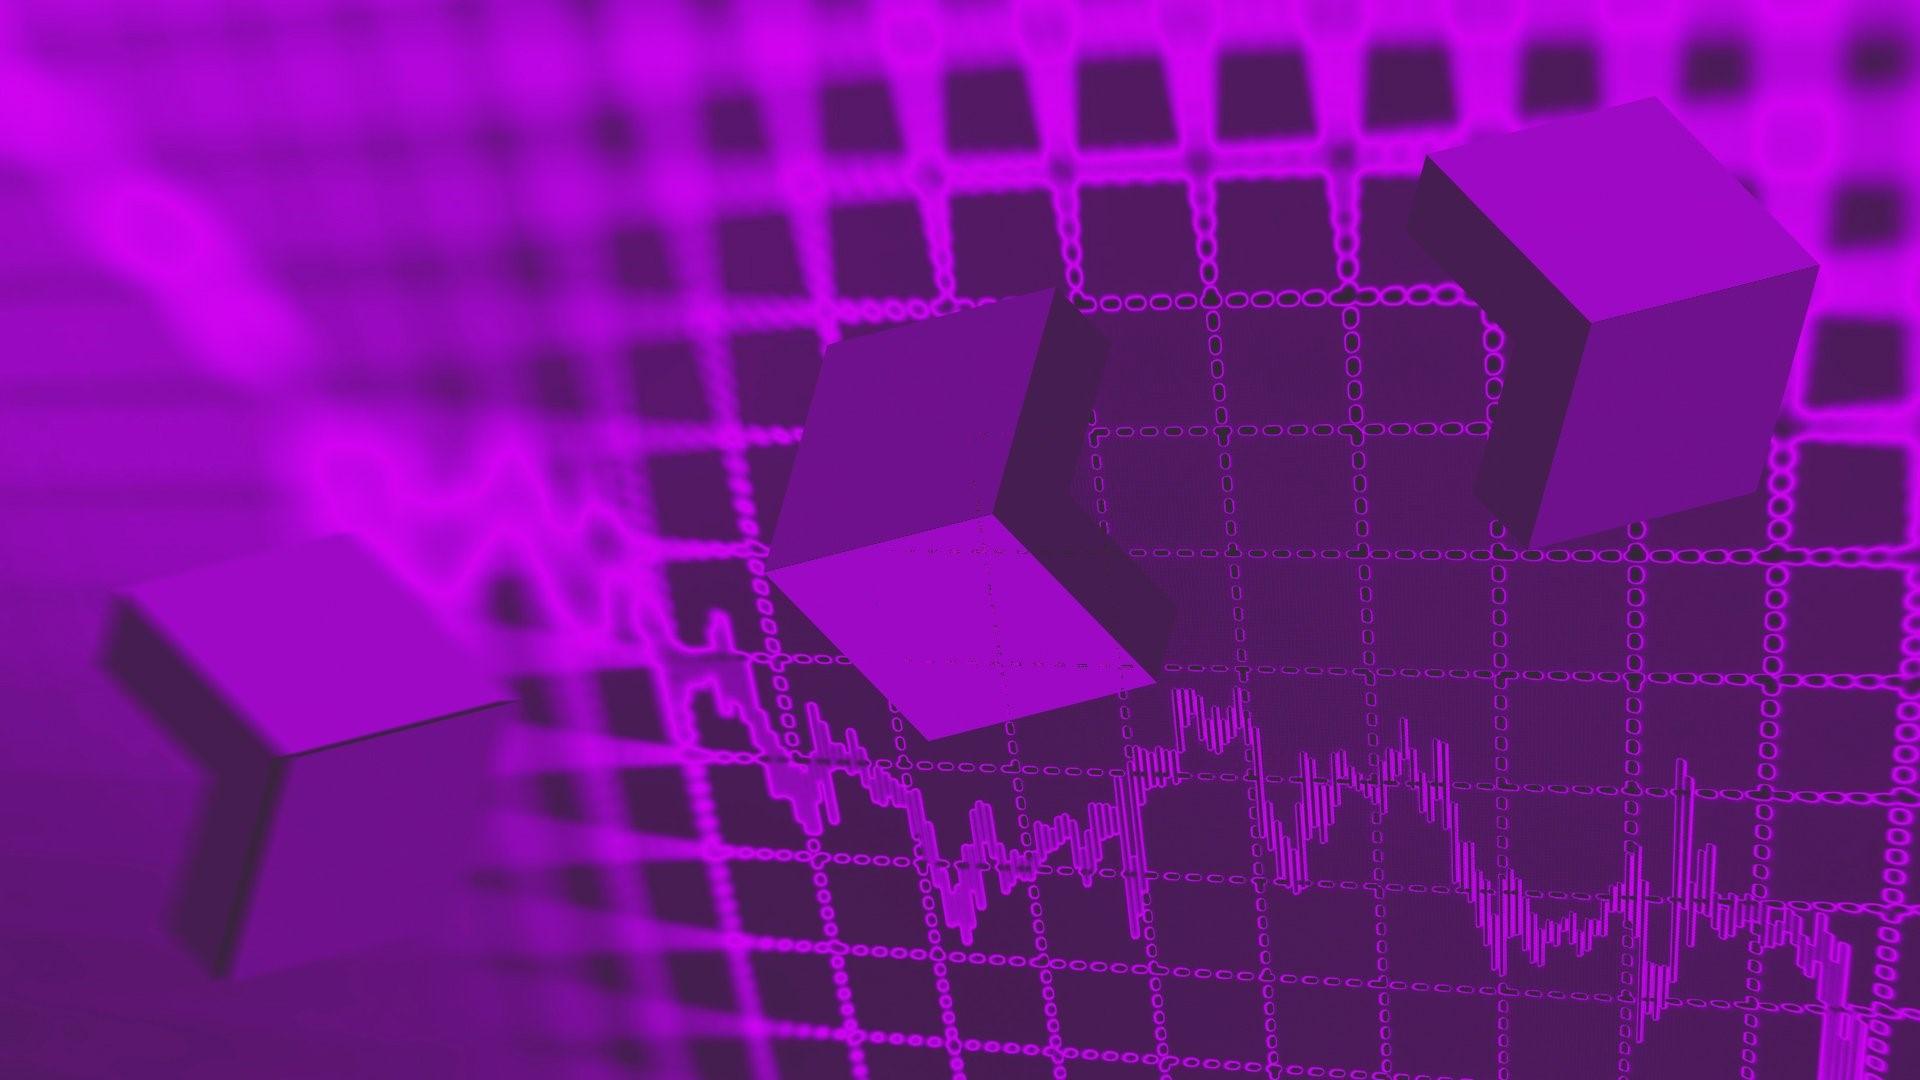 ATH Coinbase Binance - شکست رکورد حجم معاملات روزانه صرافیهای رمزنگاری Coinbase و Binance